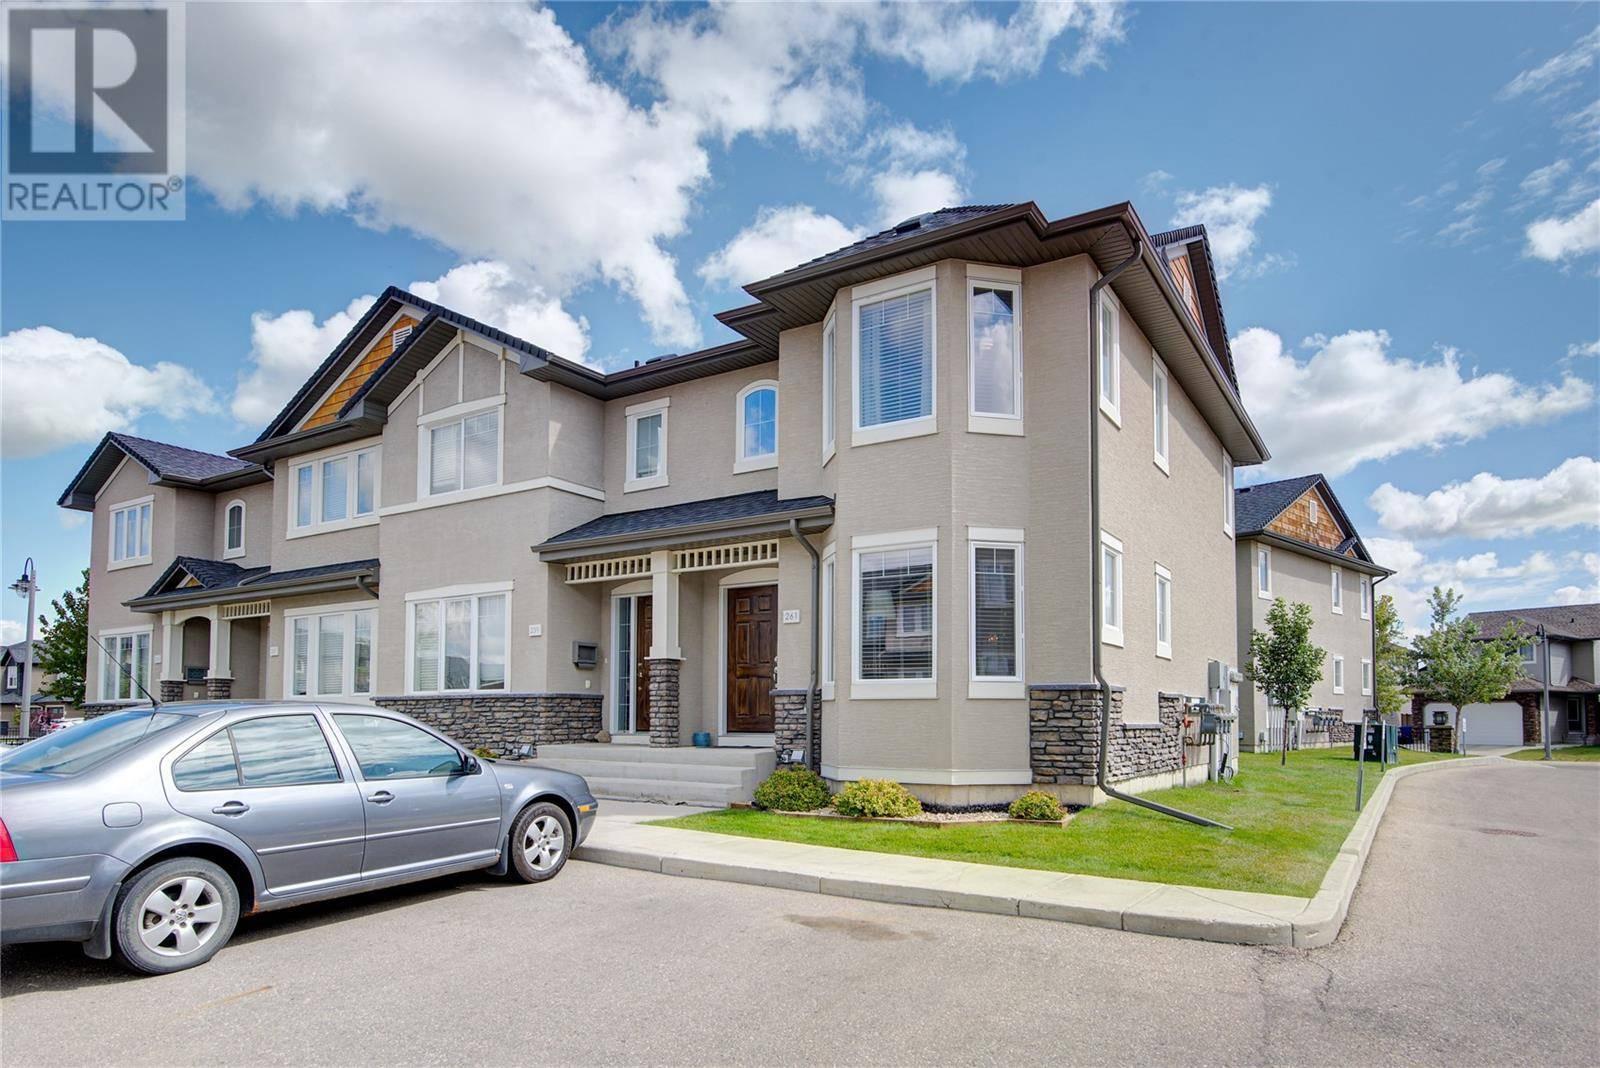 Townhouse for sale at 245 Ashworth Cres Unit 261 Saskatoon Saskatchewan - MLS: SK788642